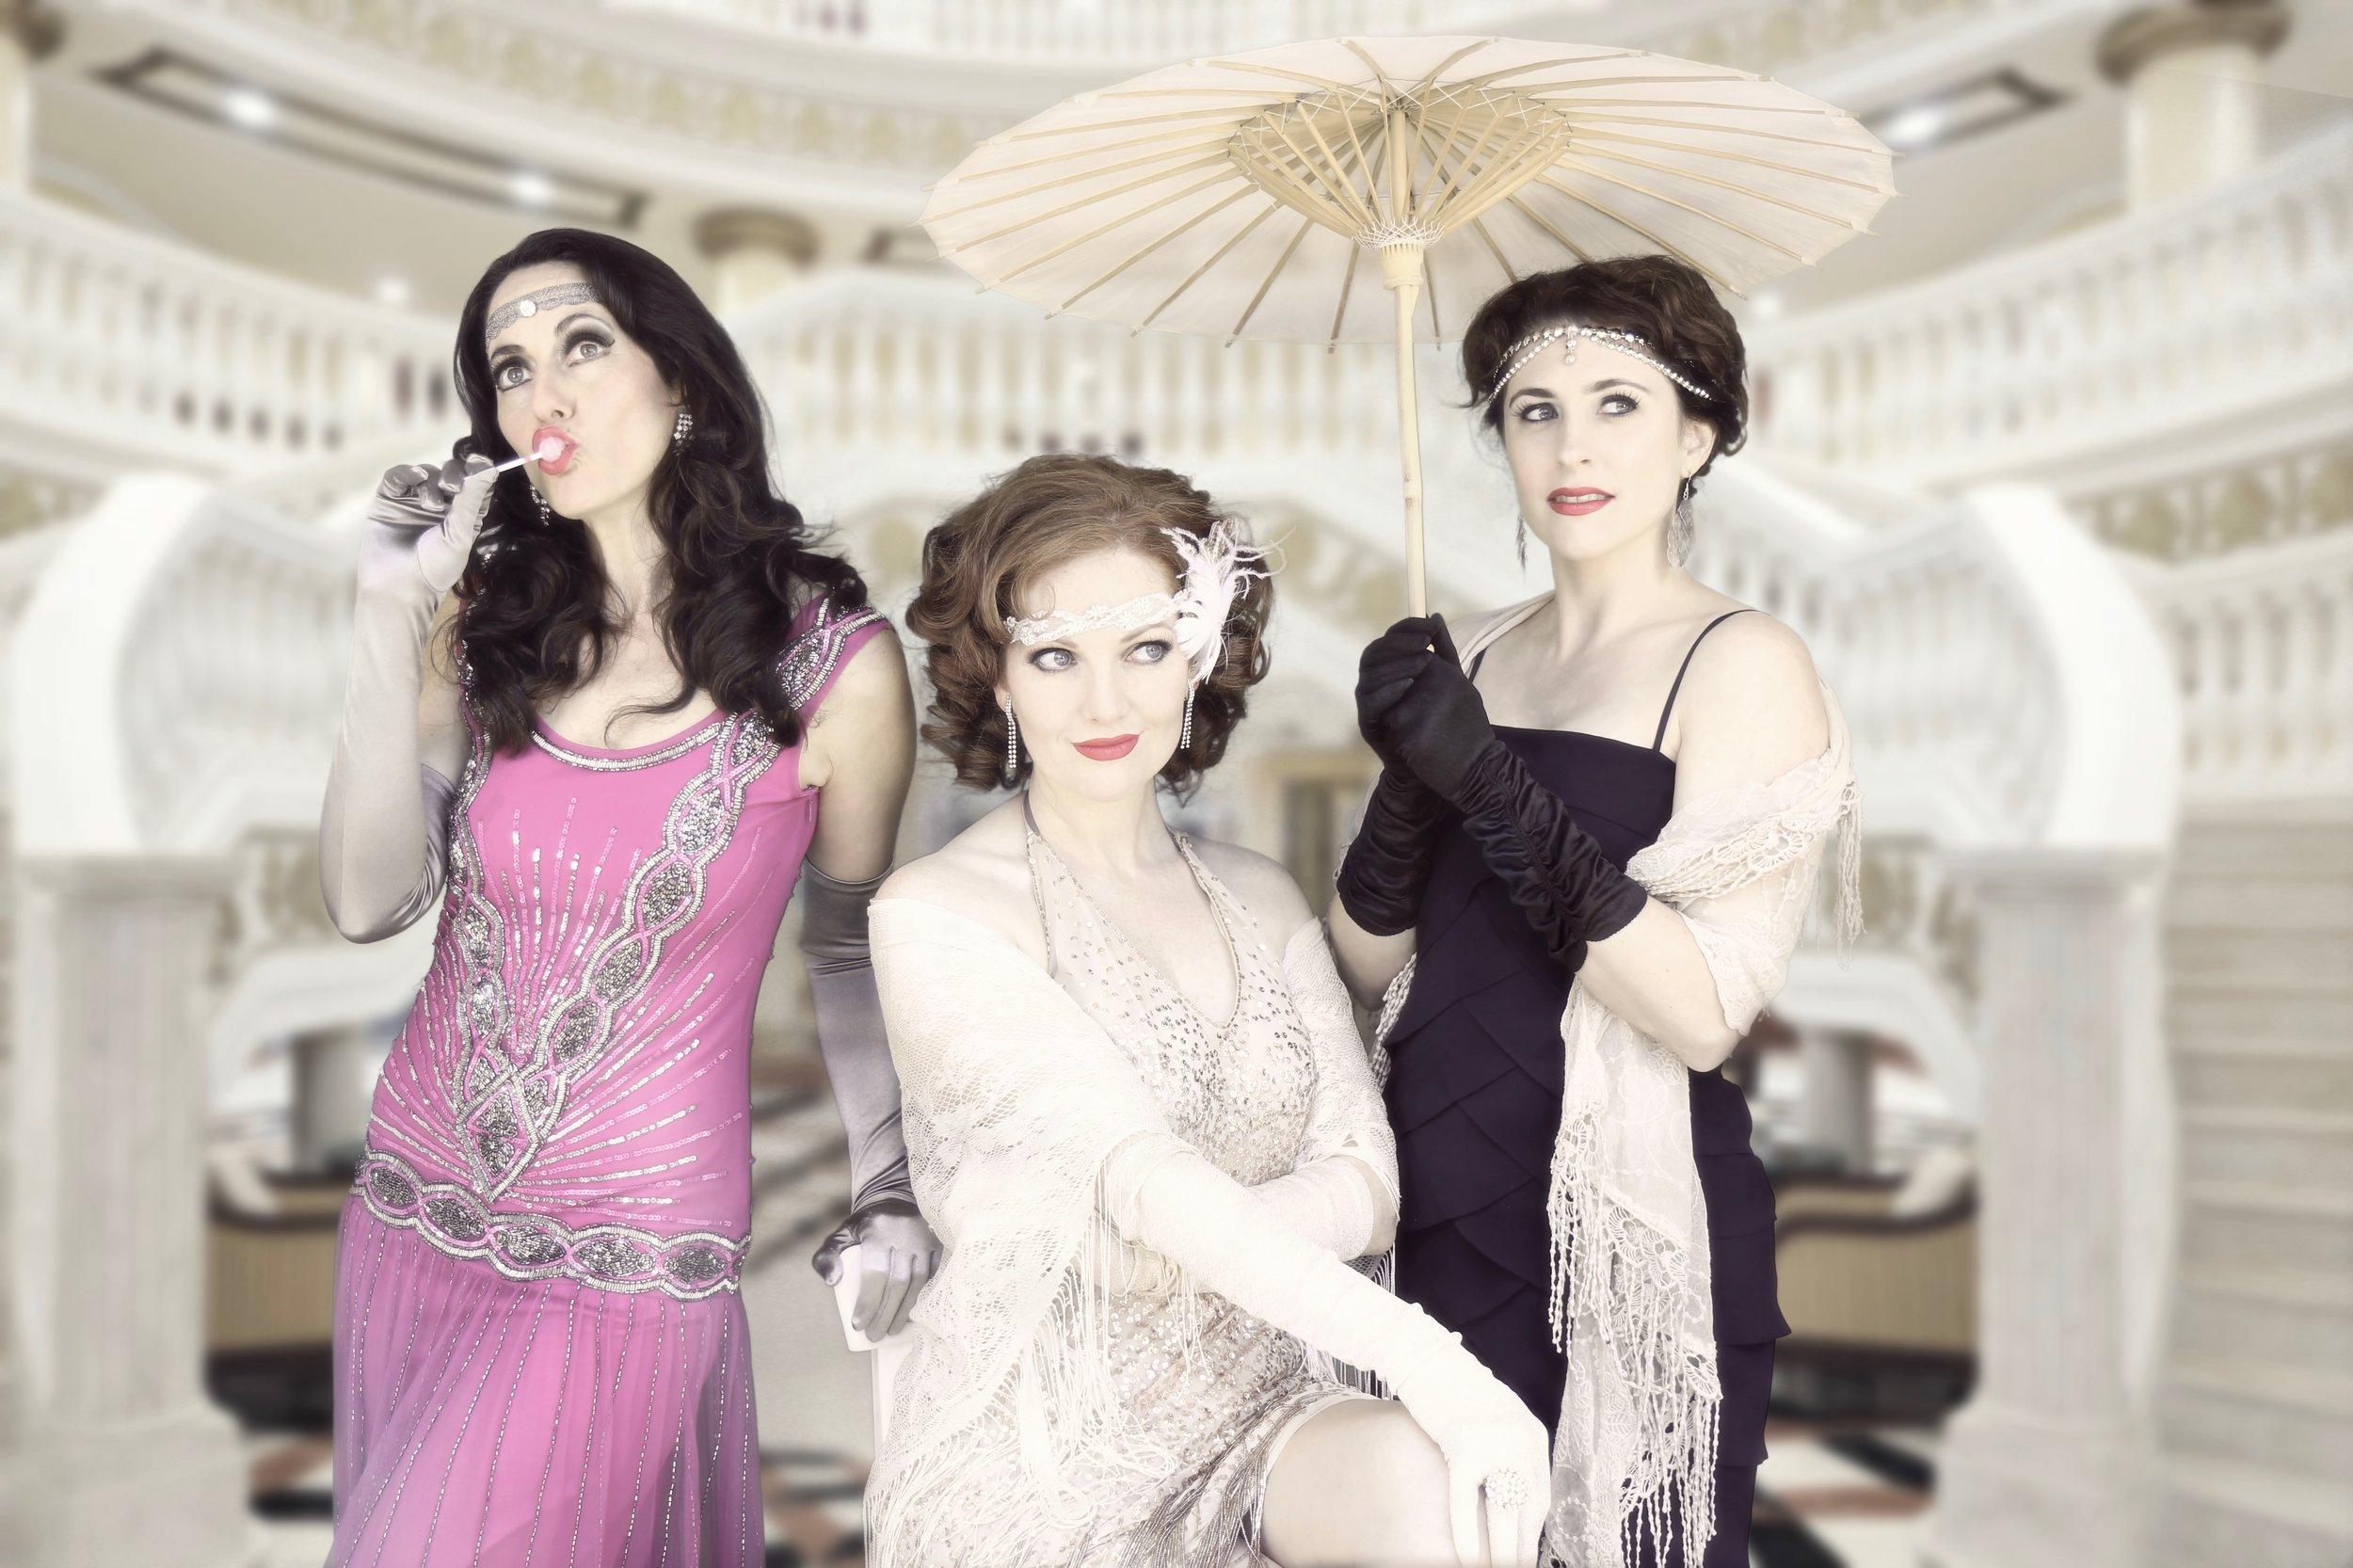 Simone, Kara and Ashleigh 1920s  Photo credit: Nicholas Maude